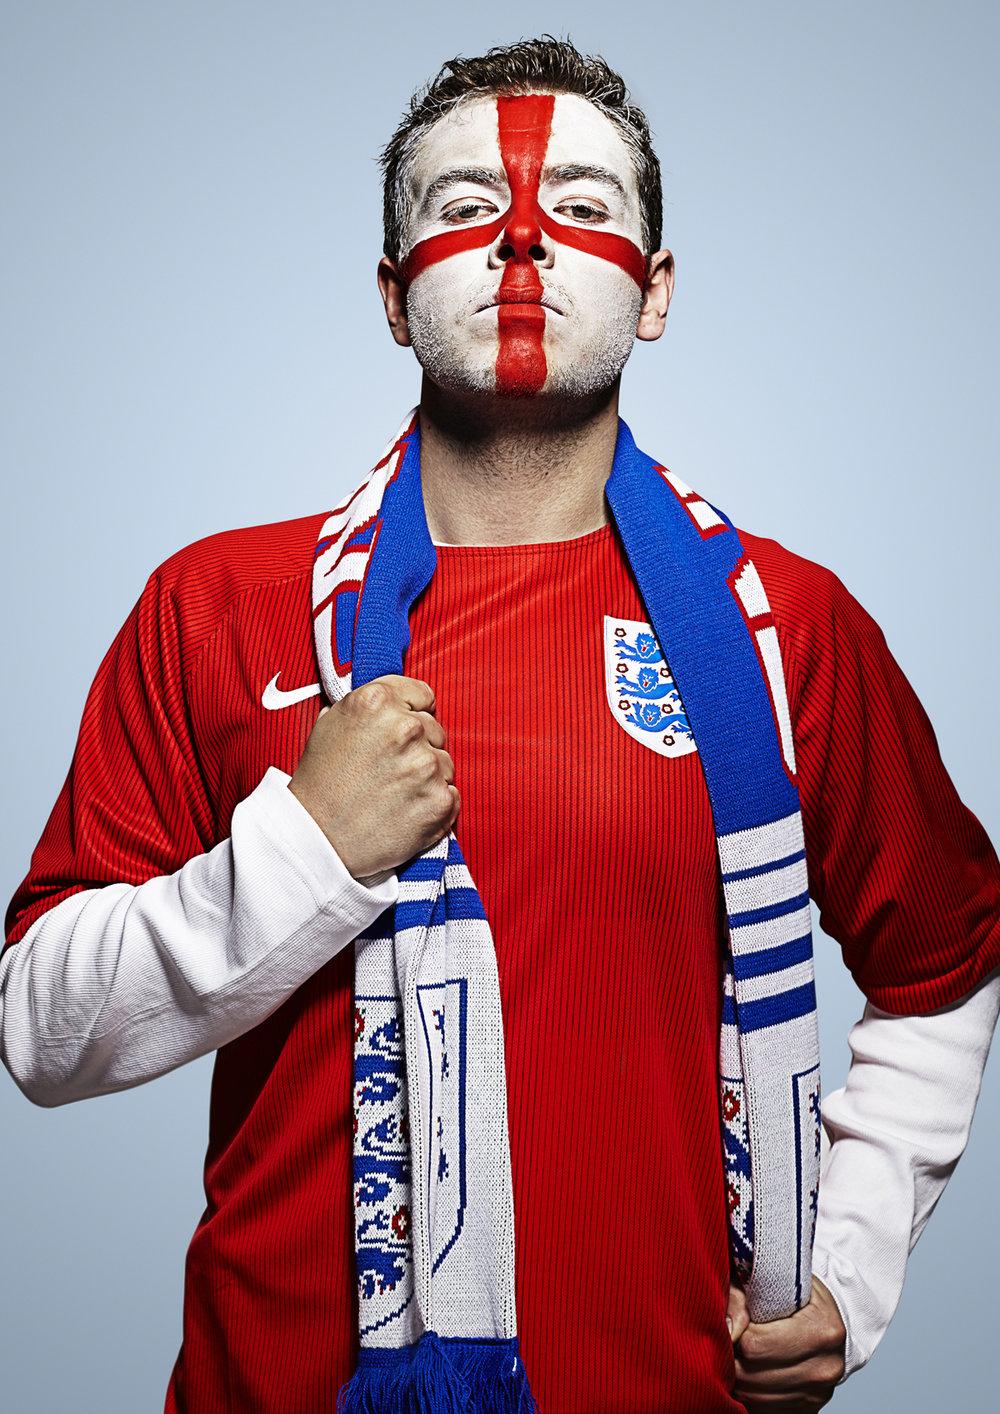 RanaldMackechnie.FA Fans. Futureproof5.jpg